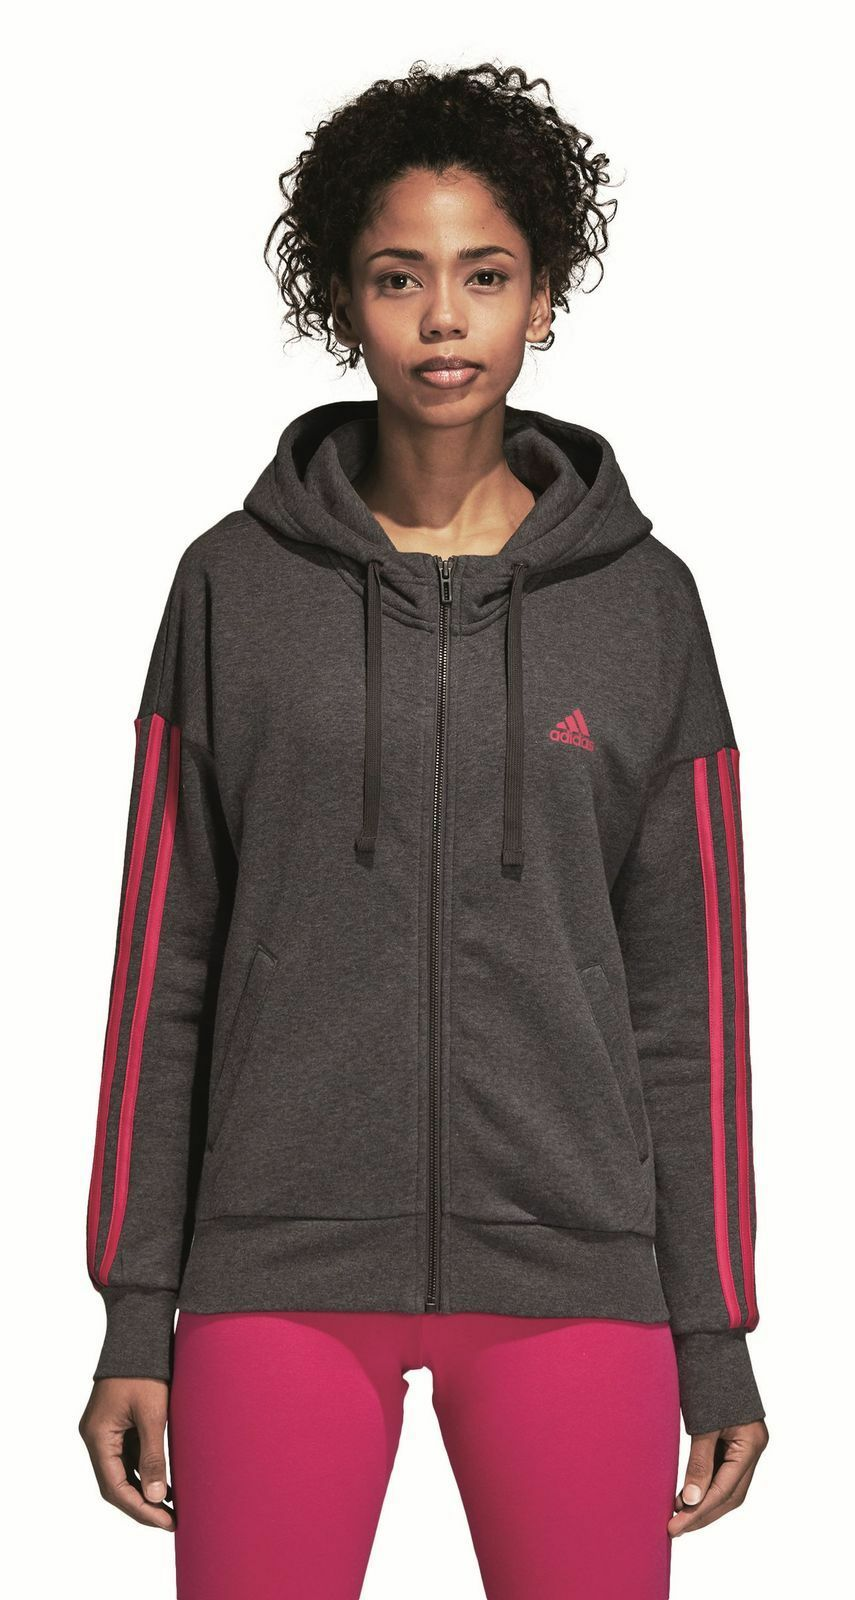 Adidas Performance Women's Sports Hoody 3 Stripes Fullzip Hoodie Grey Red